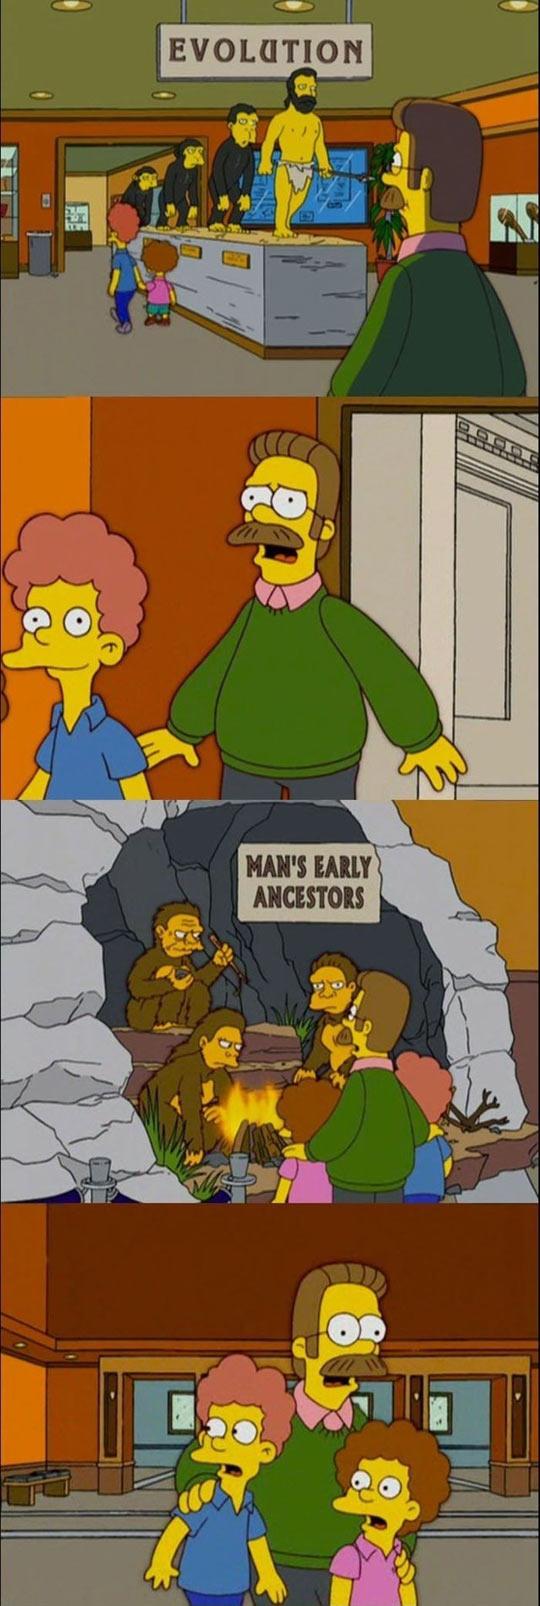 funny-Flanders-Simpsons-museum-evolution